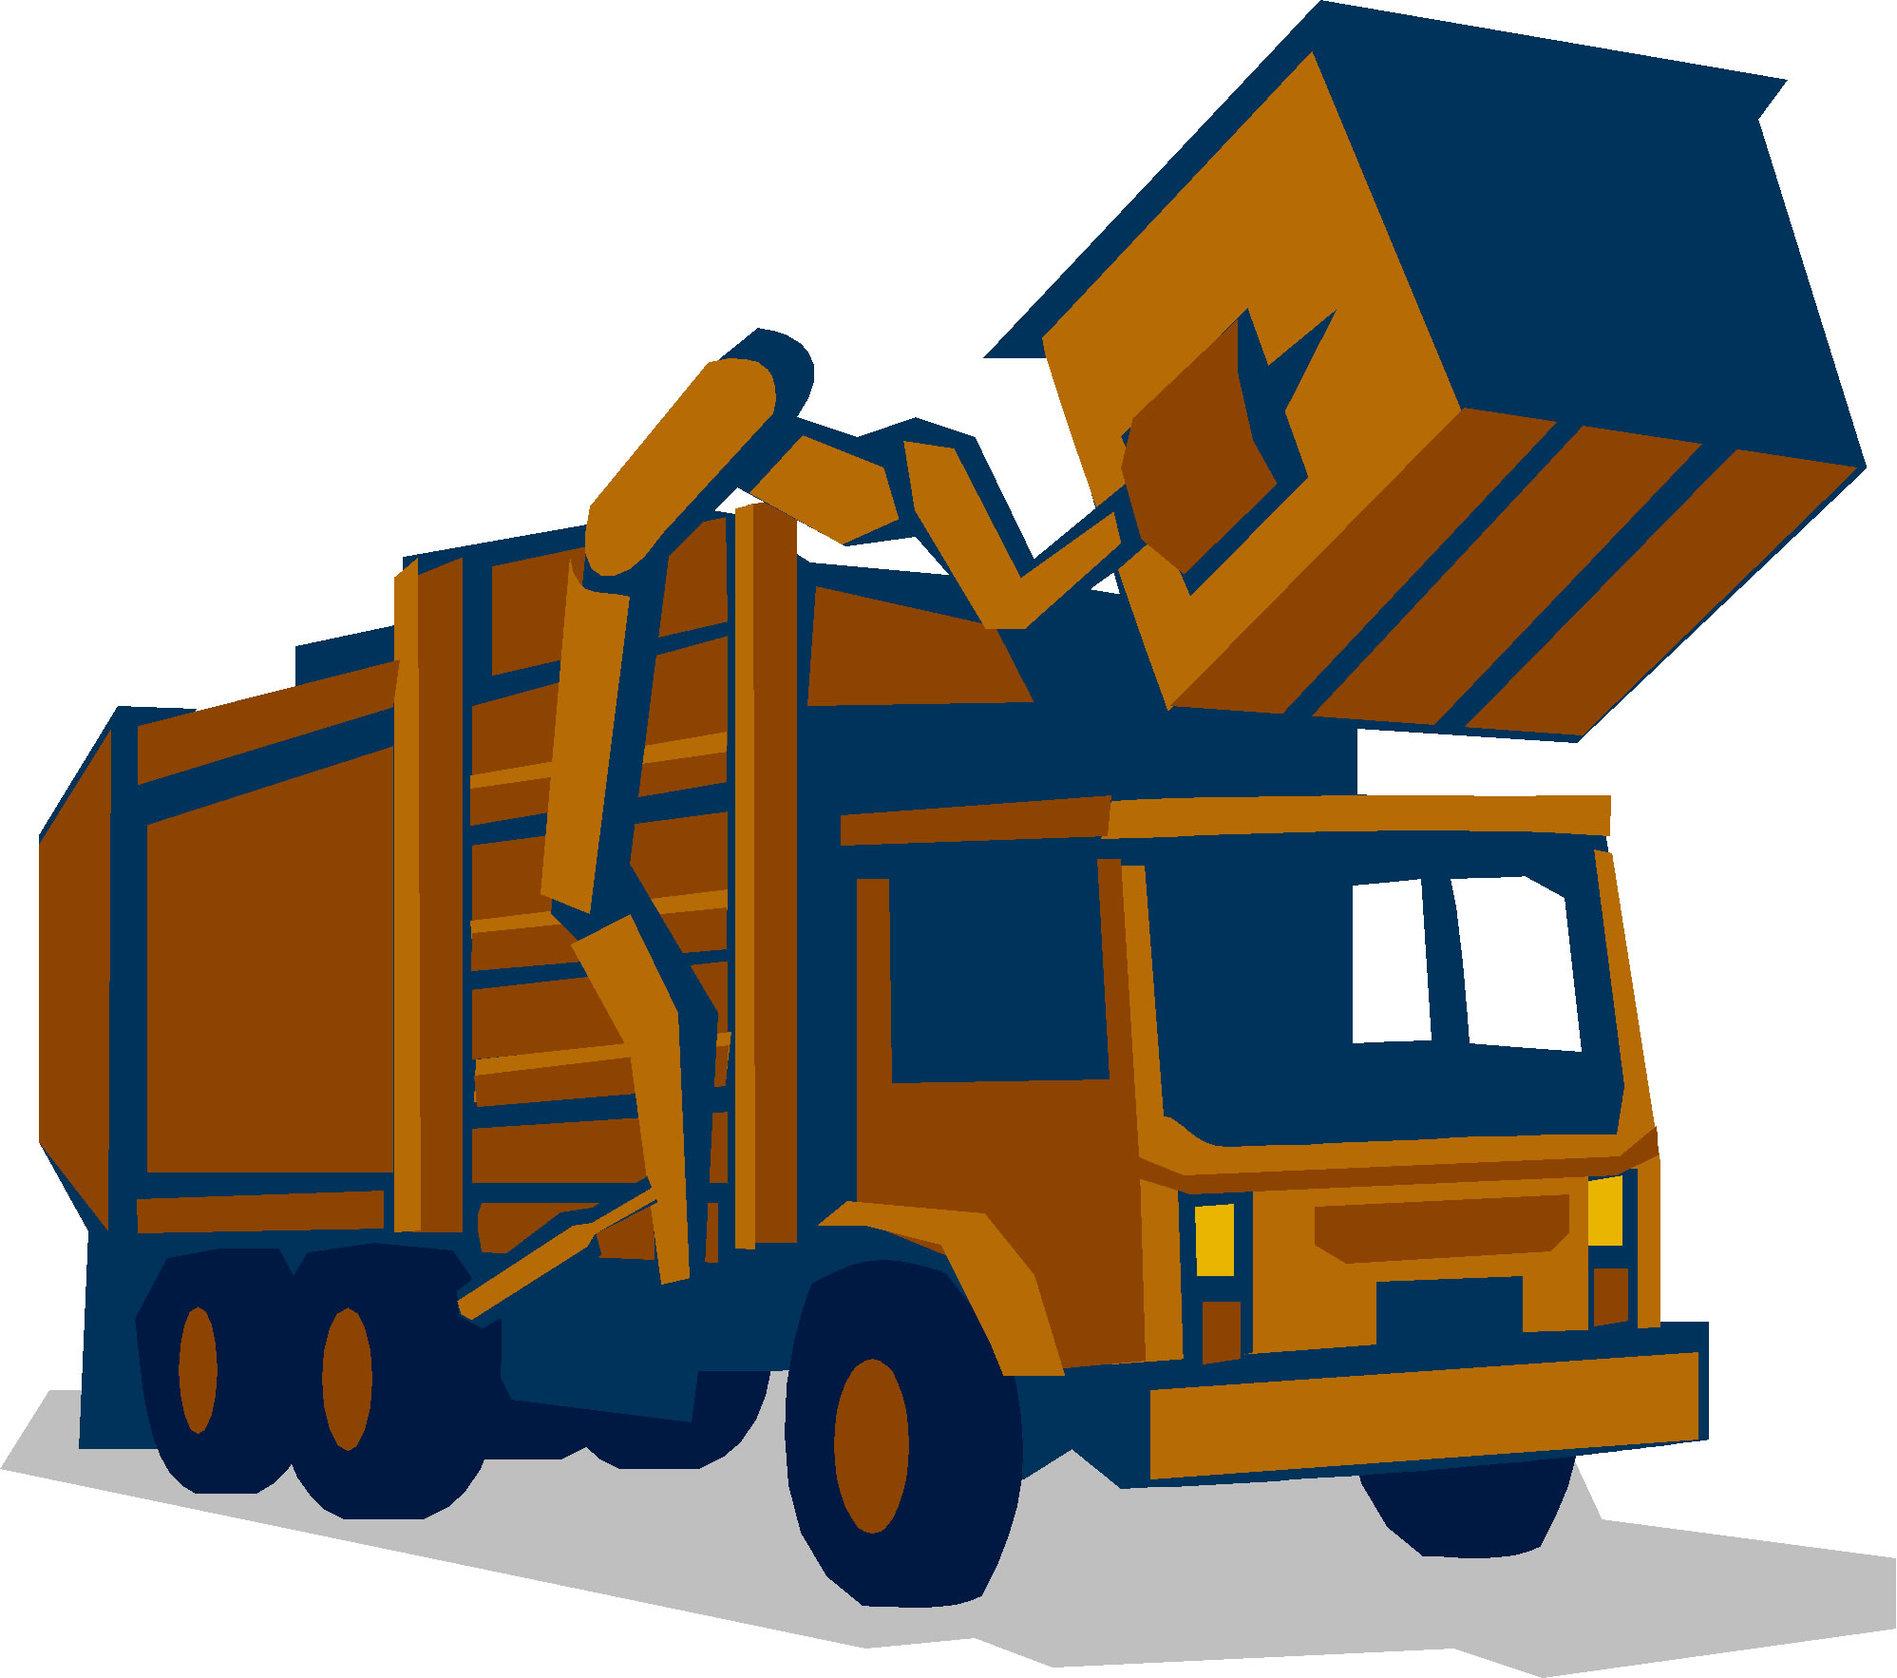 Law Of The Garbage Truck-Law Of The Garbage Truck-14